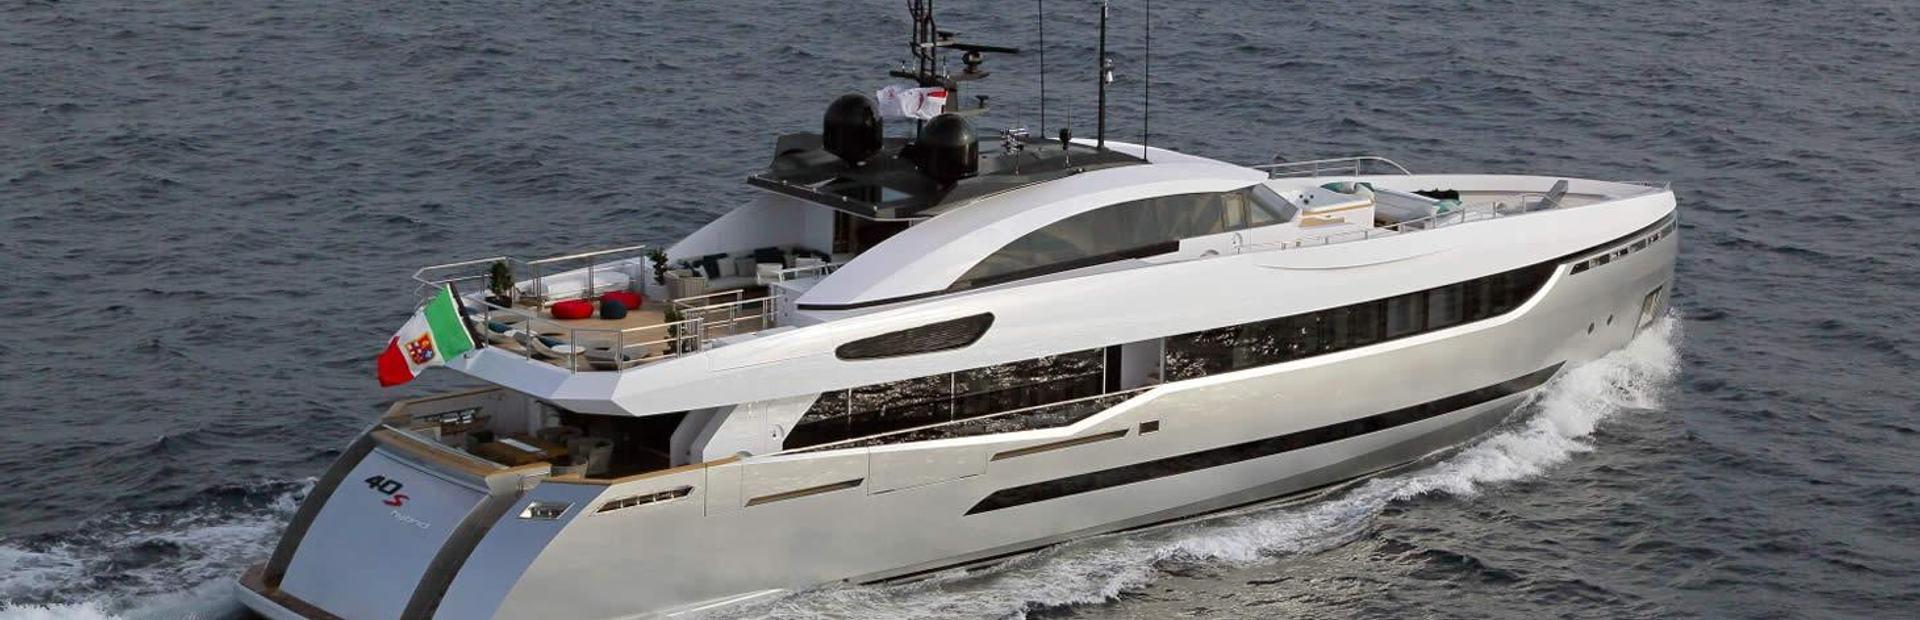 Columbus Sport 40 MT Hybrid Yacht Charter